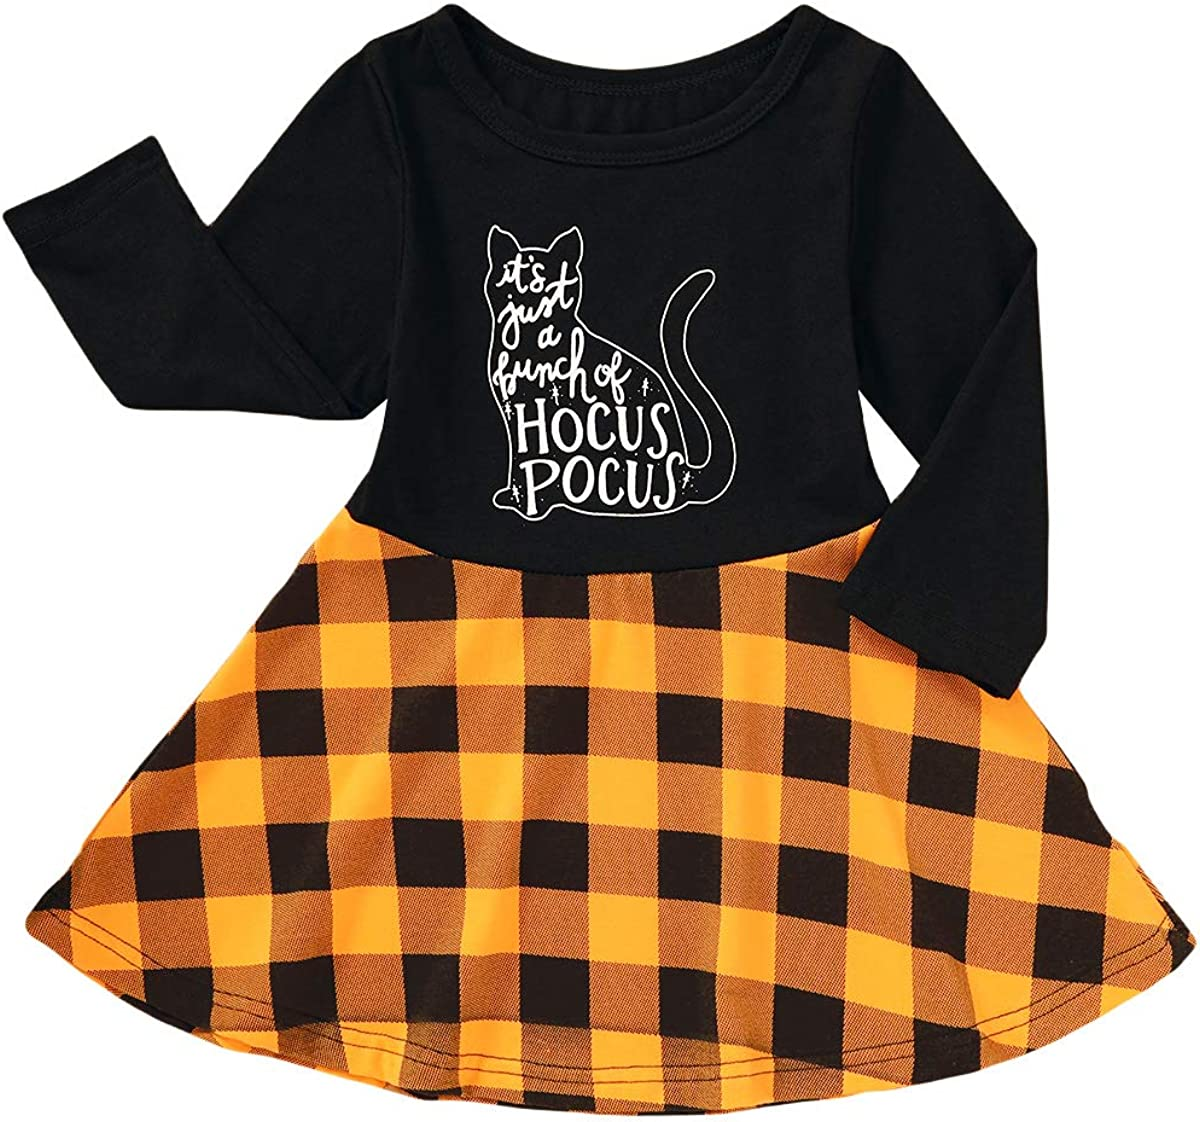 Toddler Baby Girls Clothes Halloween Dress Cartoon Pumpkin Ghost Spider Print Outfits